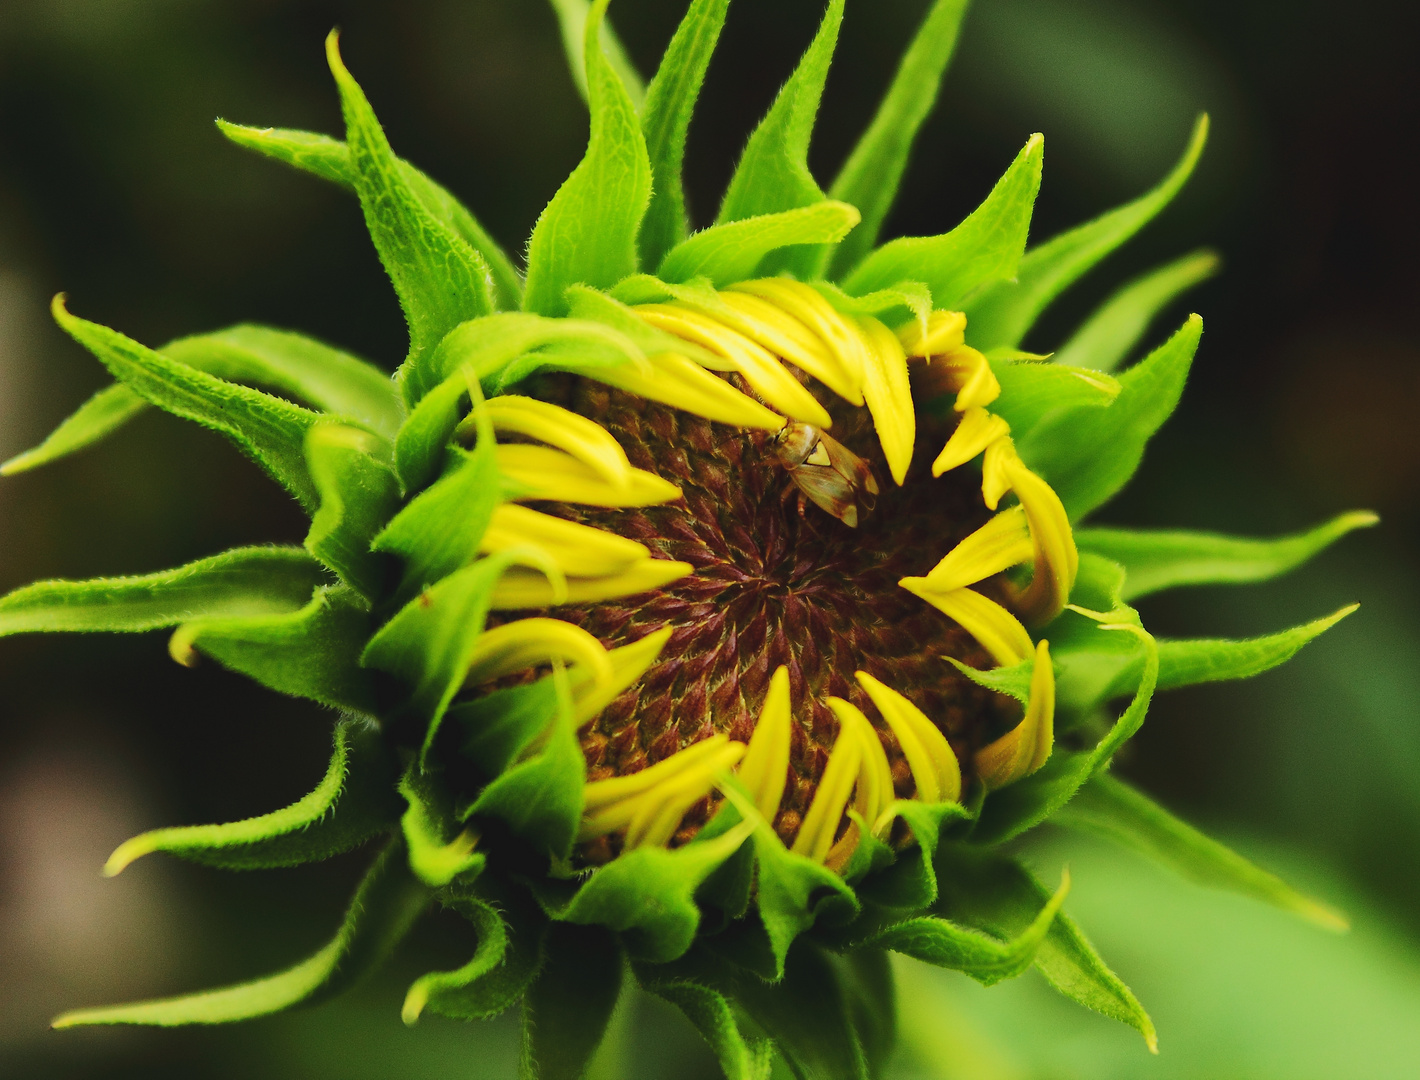 Sonnen[Blumen]schutz mal anders